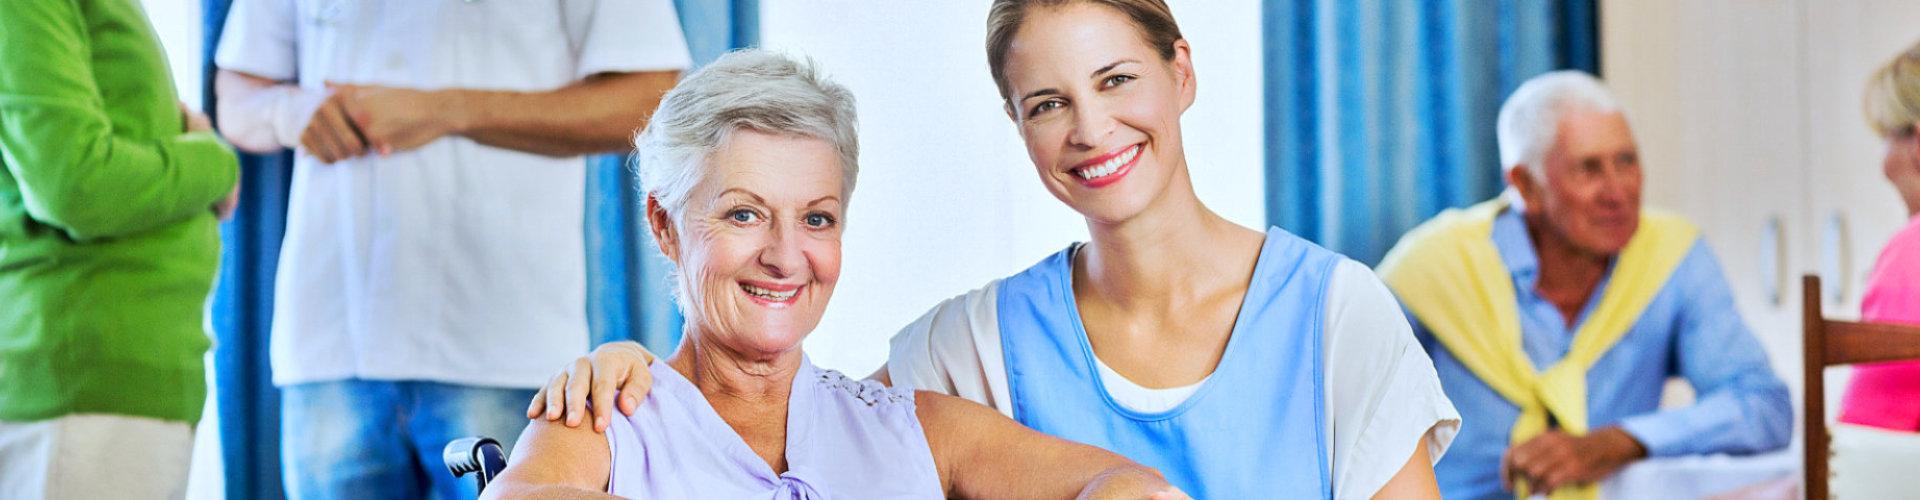 caregiver and elder woman smiling